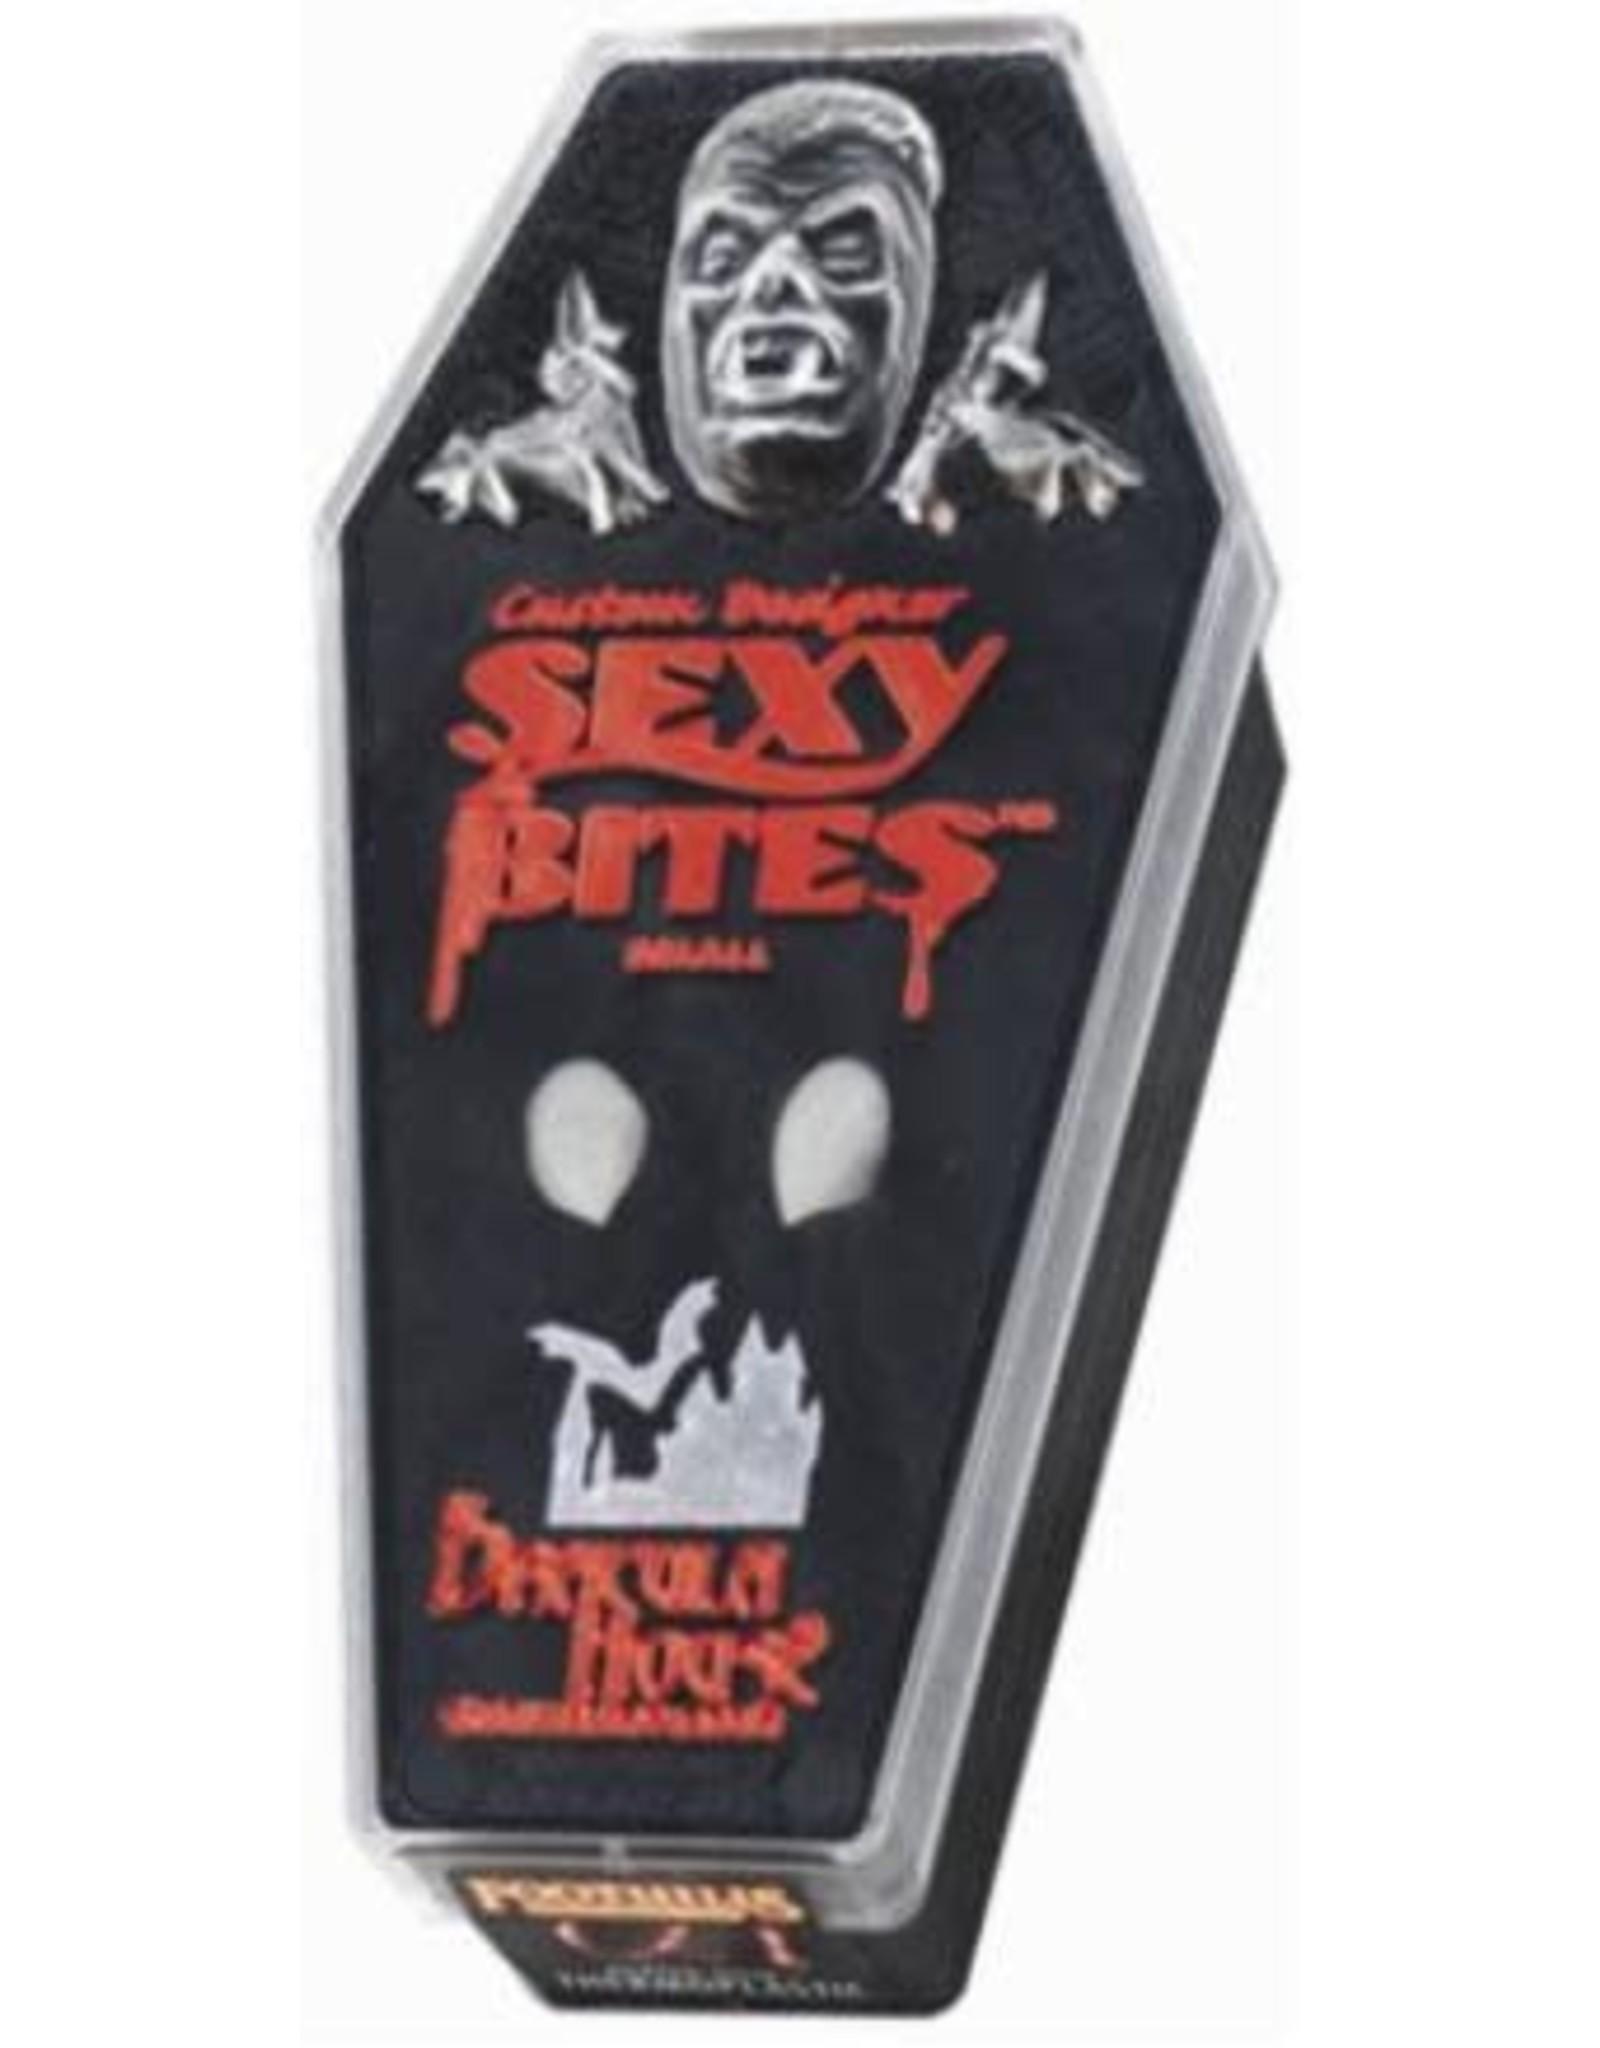 Foothills Fangs Sexy Bites Single Set